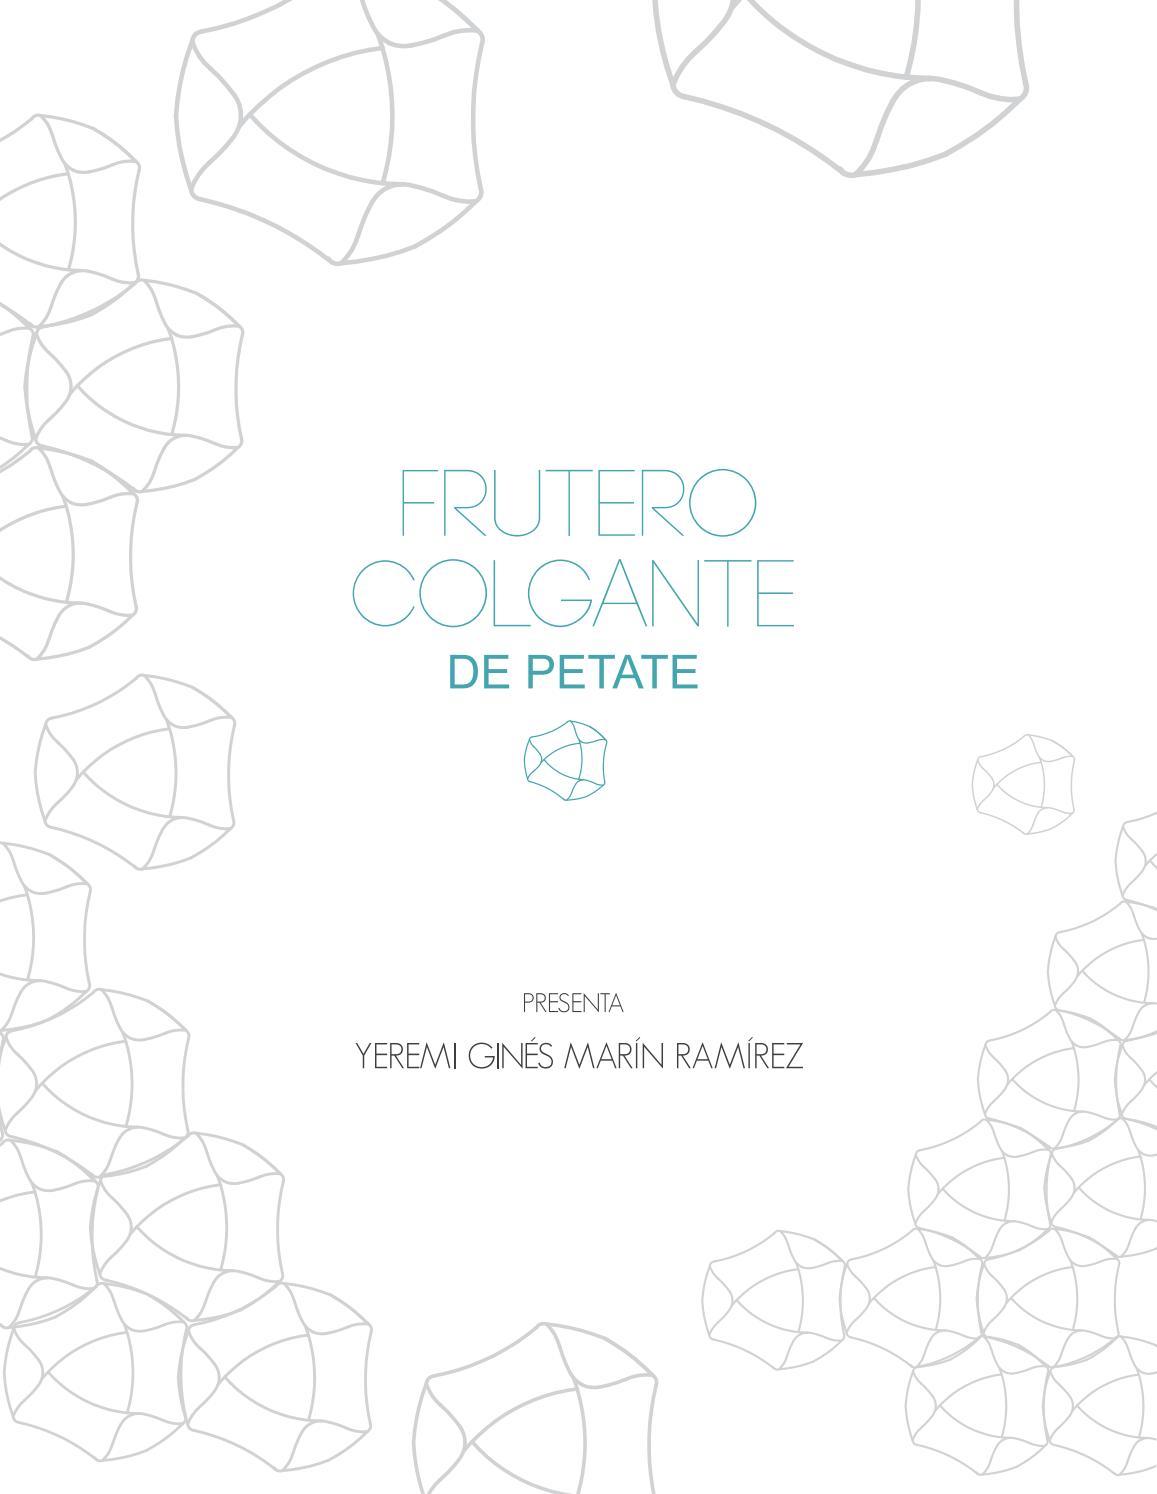 frutero colgante Frutero Colgante De Petate Yeremi Gins Marn Ramrez By